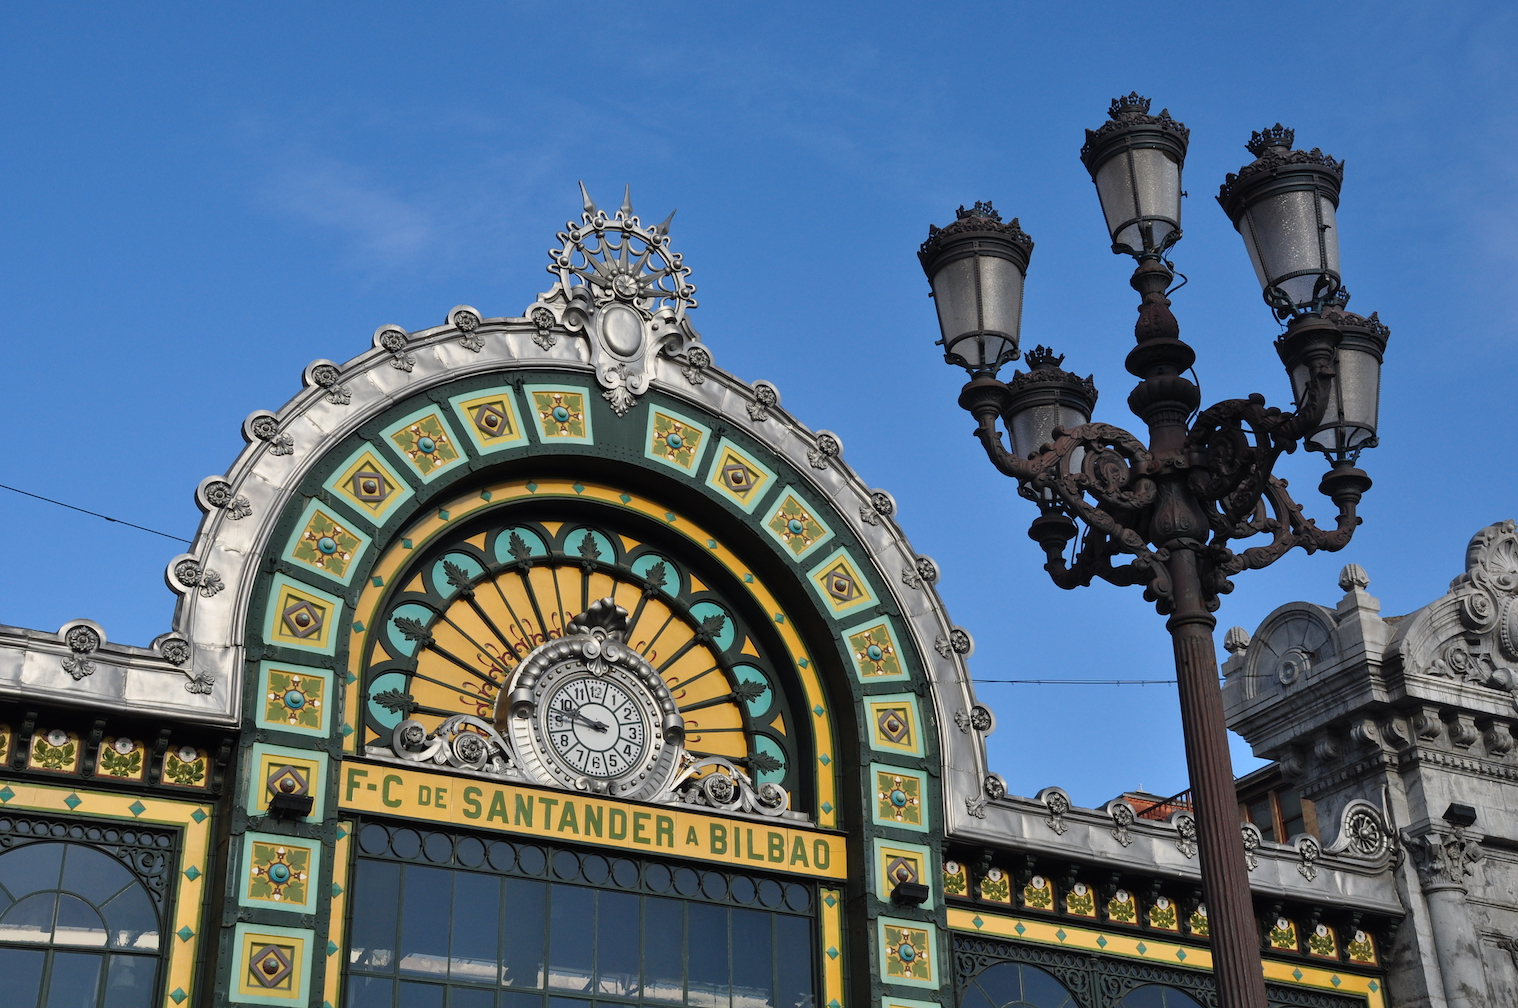 Bilbao train station on El Transcantábrico Gran Lujo: Santiago-San Sebastián Luxury Train journey